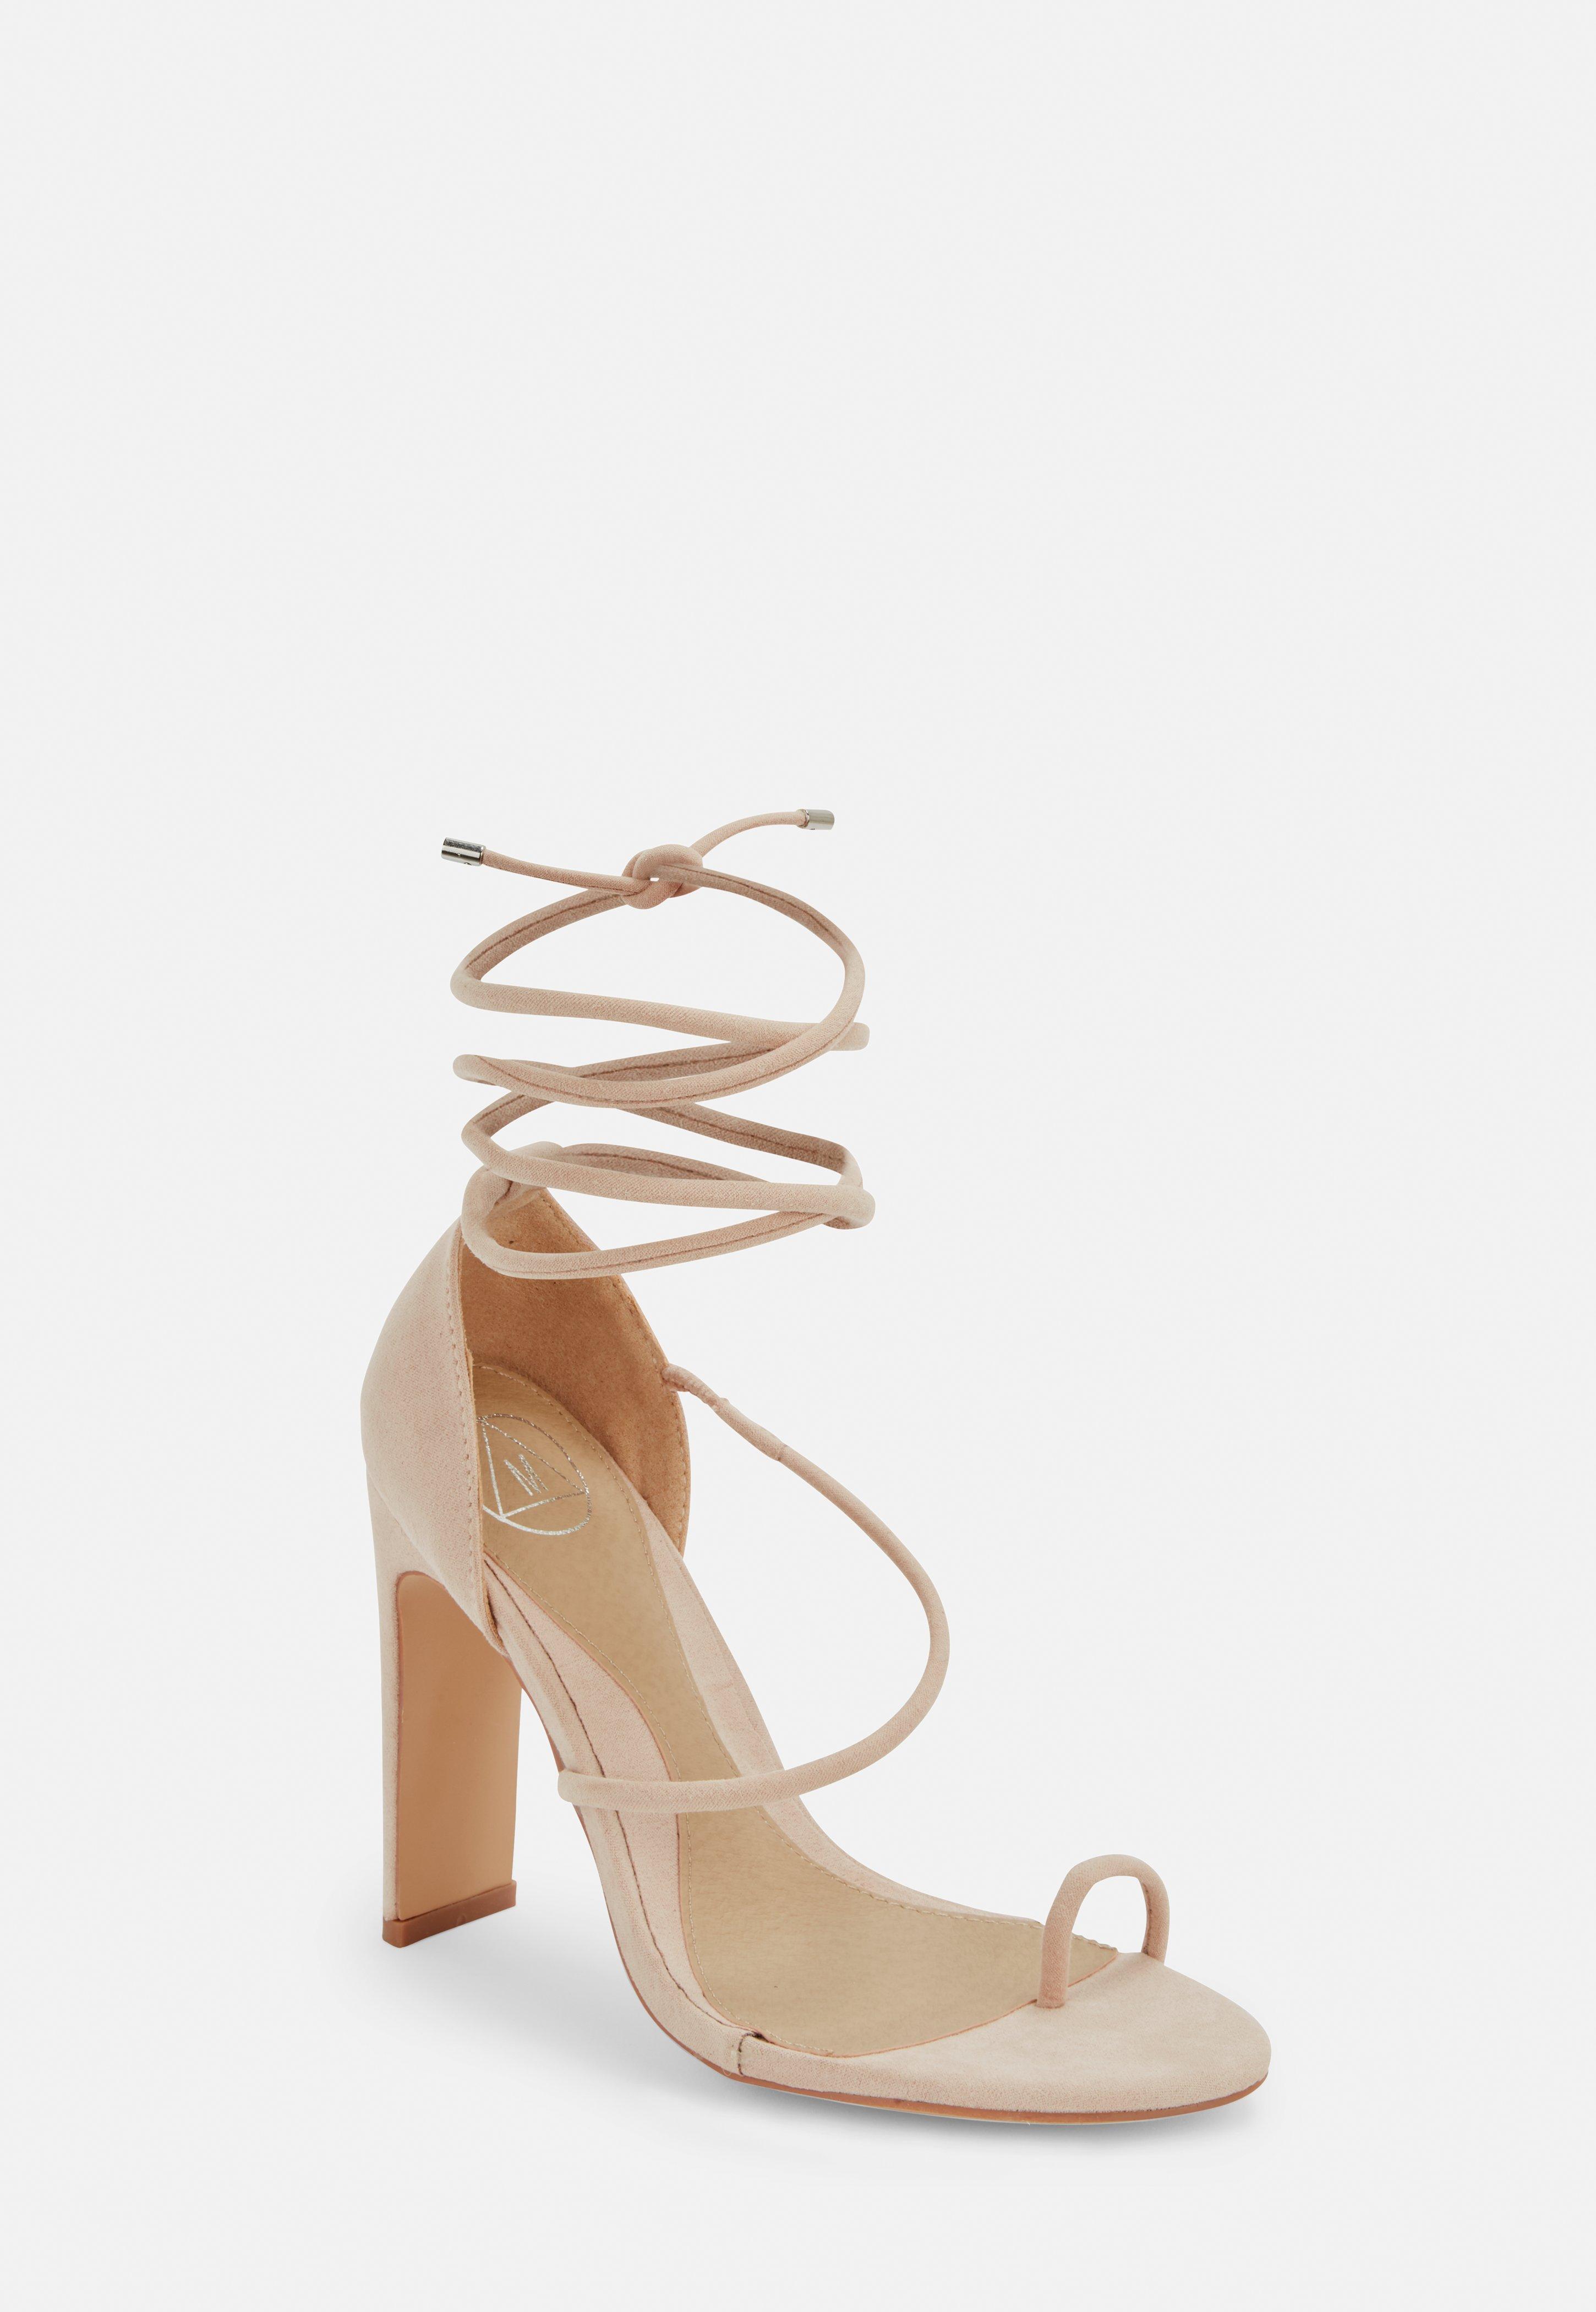 62e10892310470 Lace Up Heels